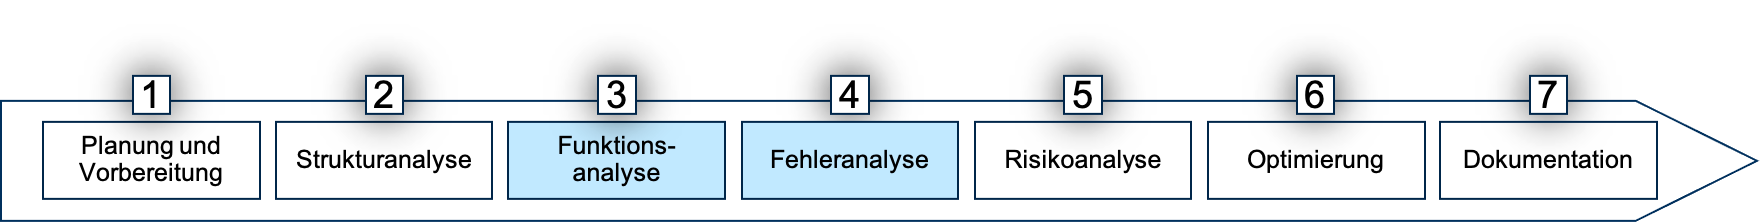 7 Schritte FMEA Schritt 3 und4 Banner